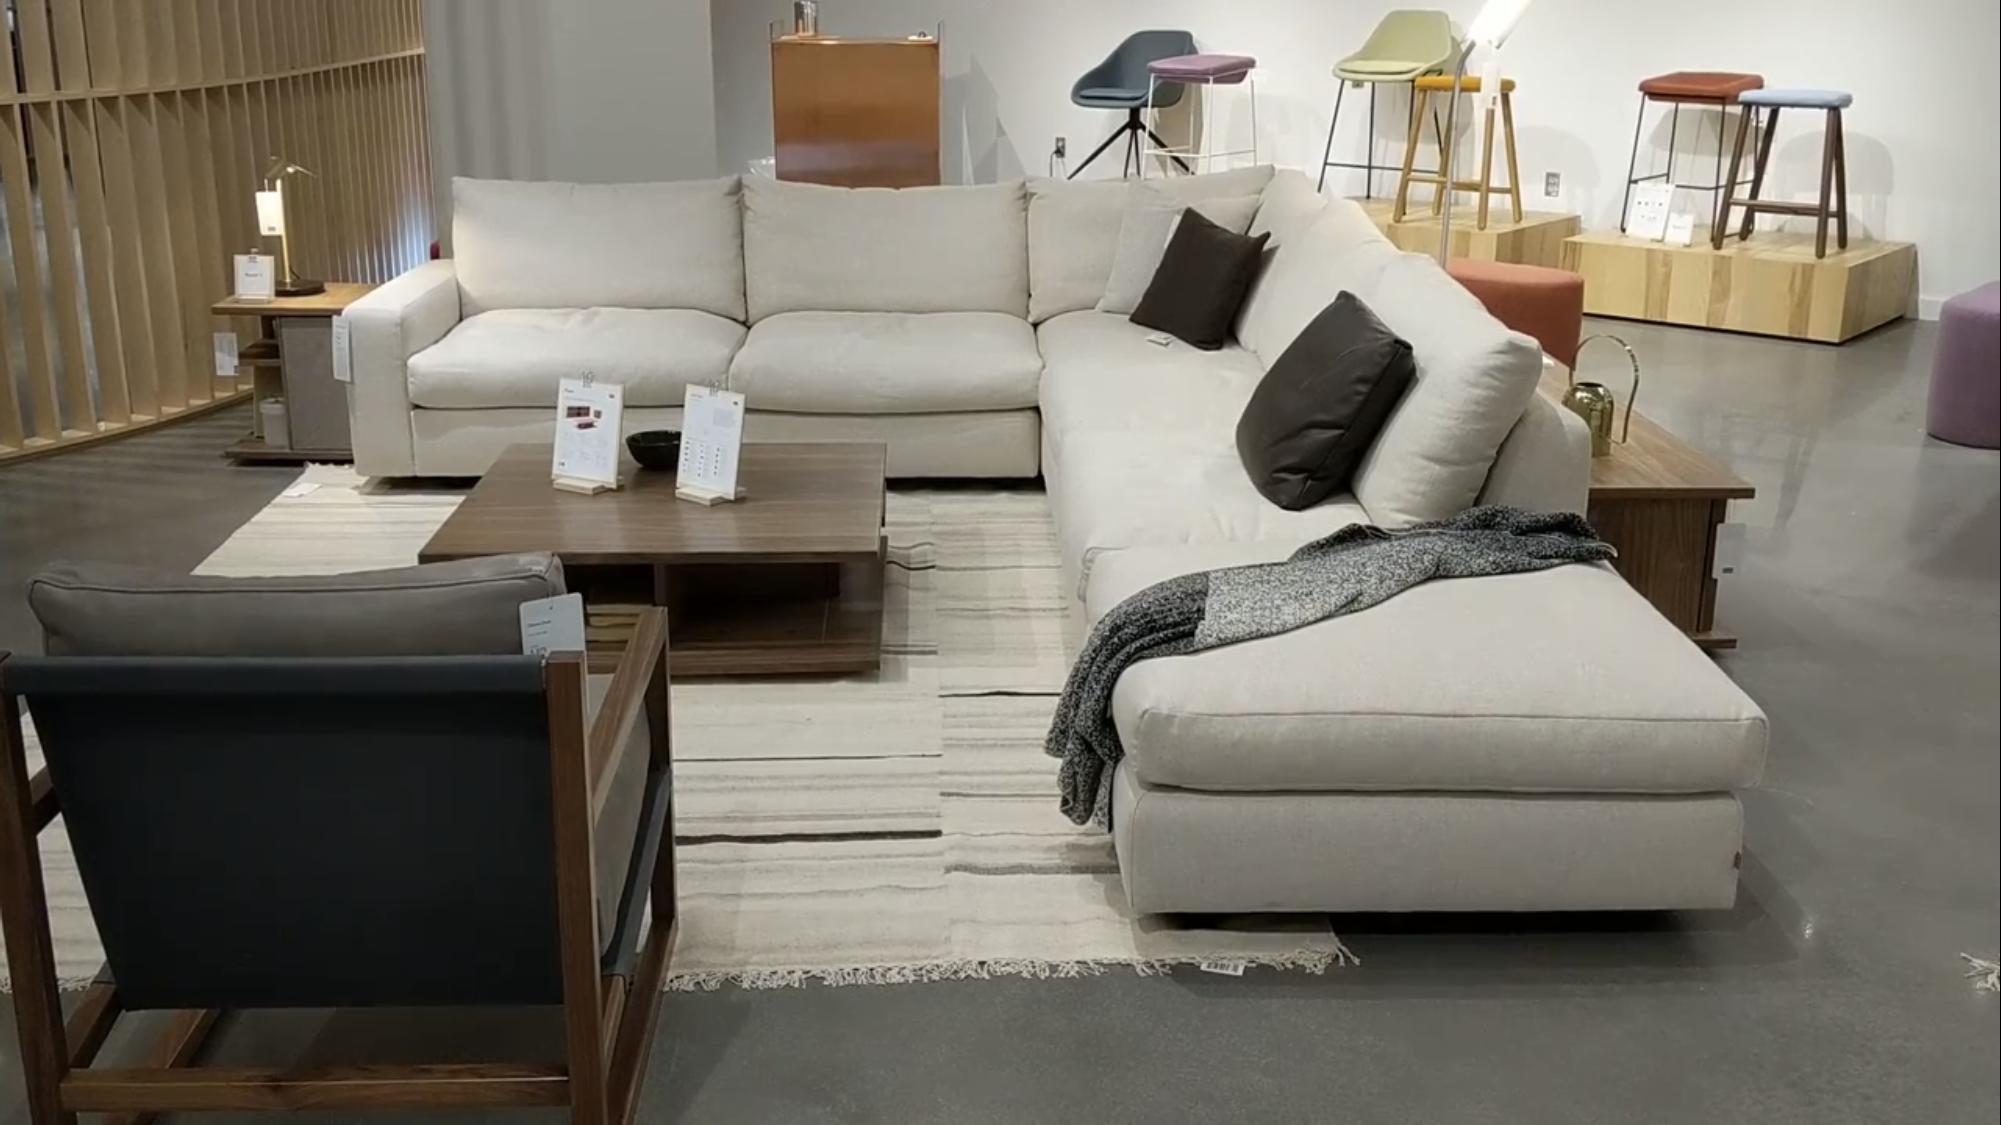 Eq3 Cello Sectional At Rubin S Furniture 2999 Starting In Fabric Furniture Contemporary Furniture Stores Sofa Furniture